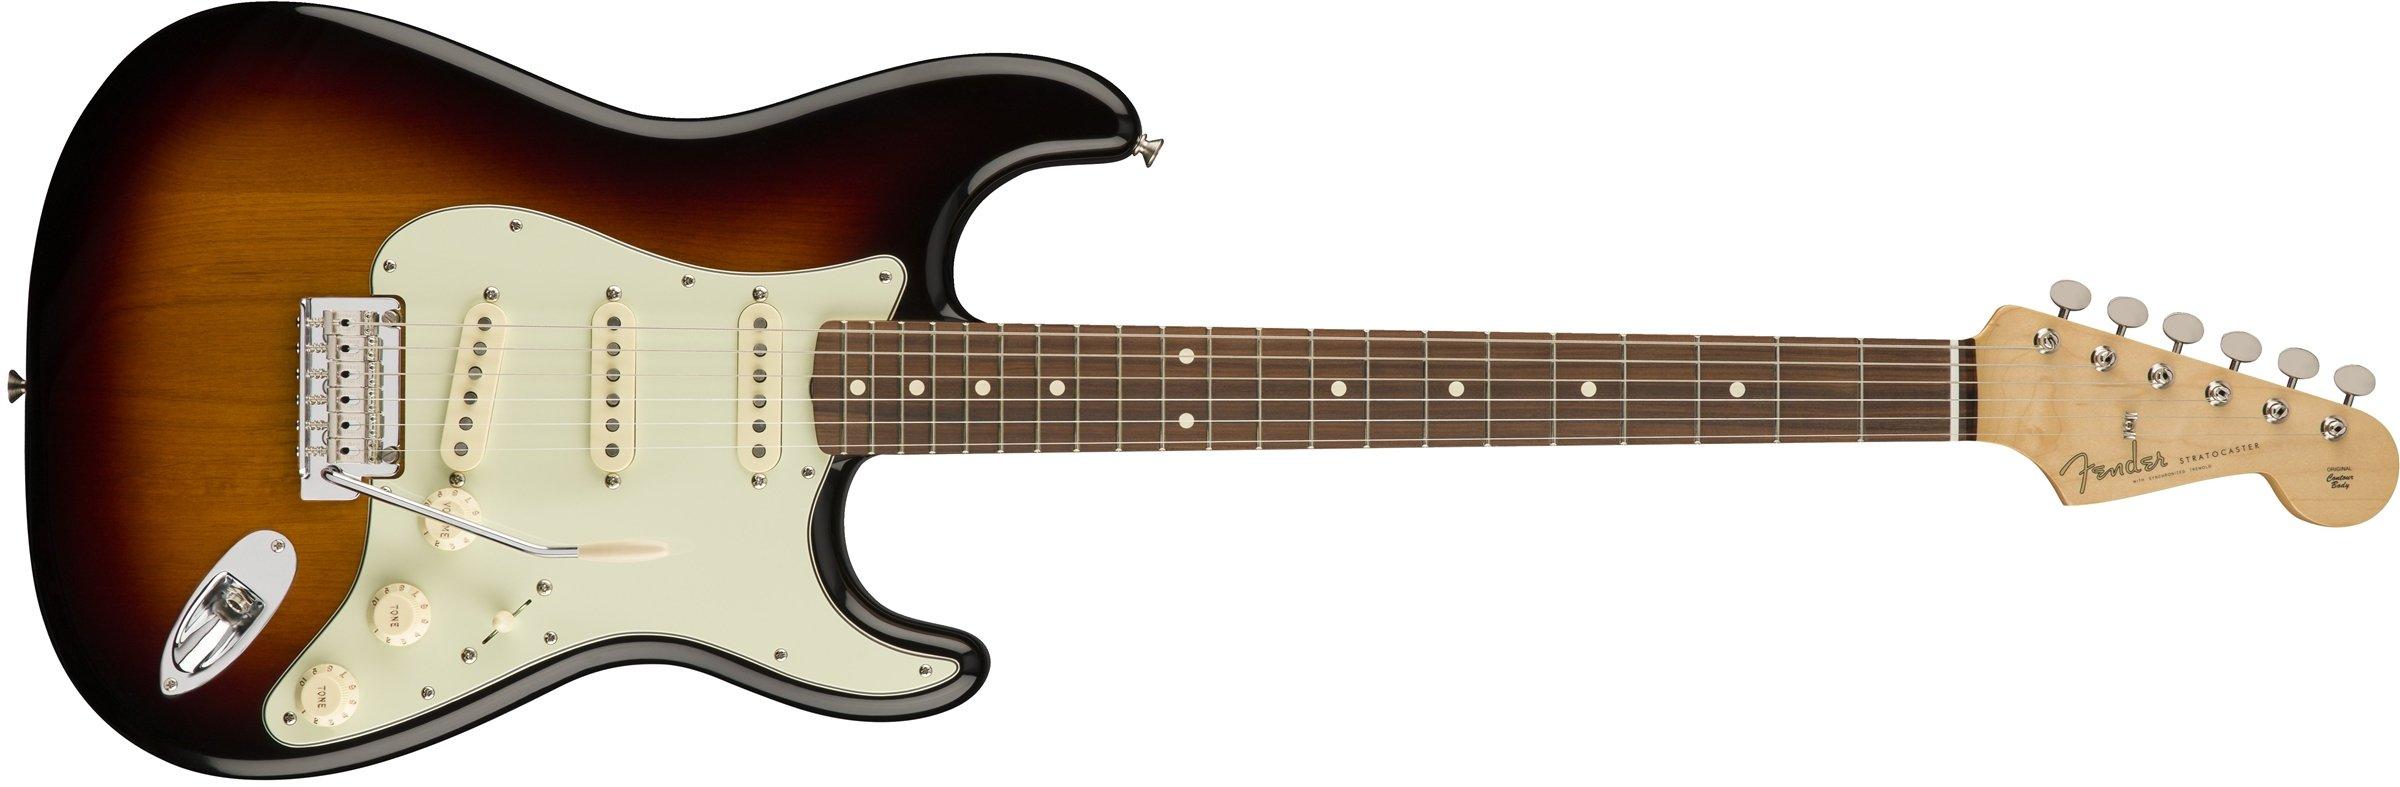 Cheap Fender Classic Player 60 s Stratocaster Electric Guitar - Pau Ferro Fingerboard - 3-Color Sunburst Black Friday & Cyber Monday 2019